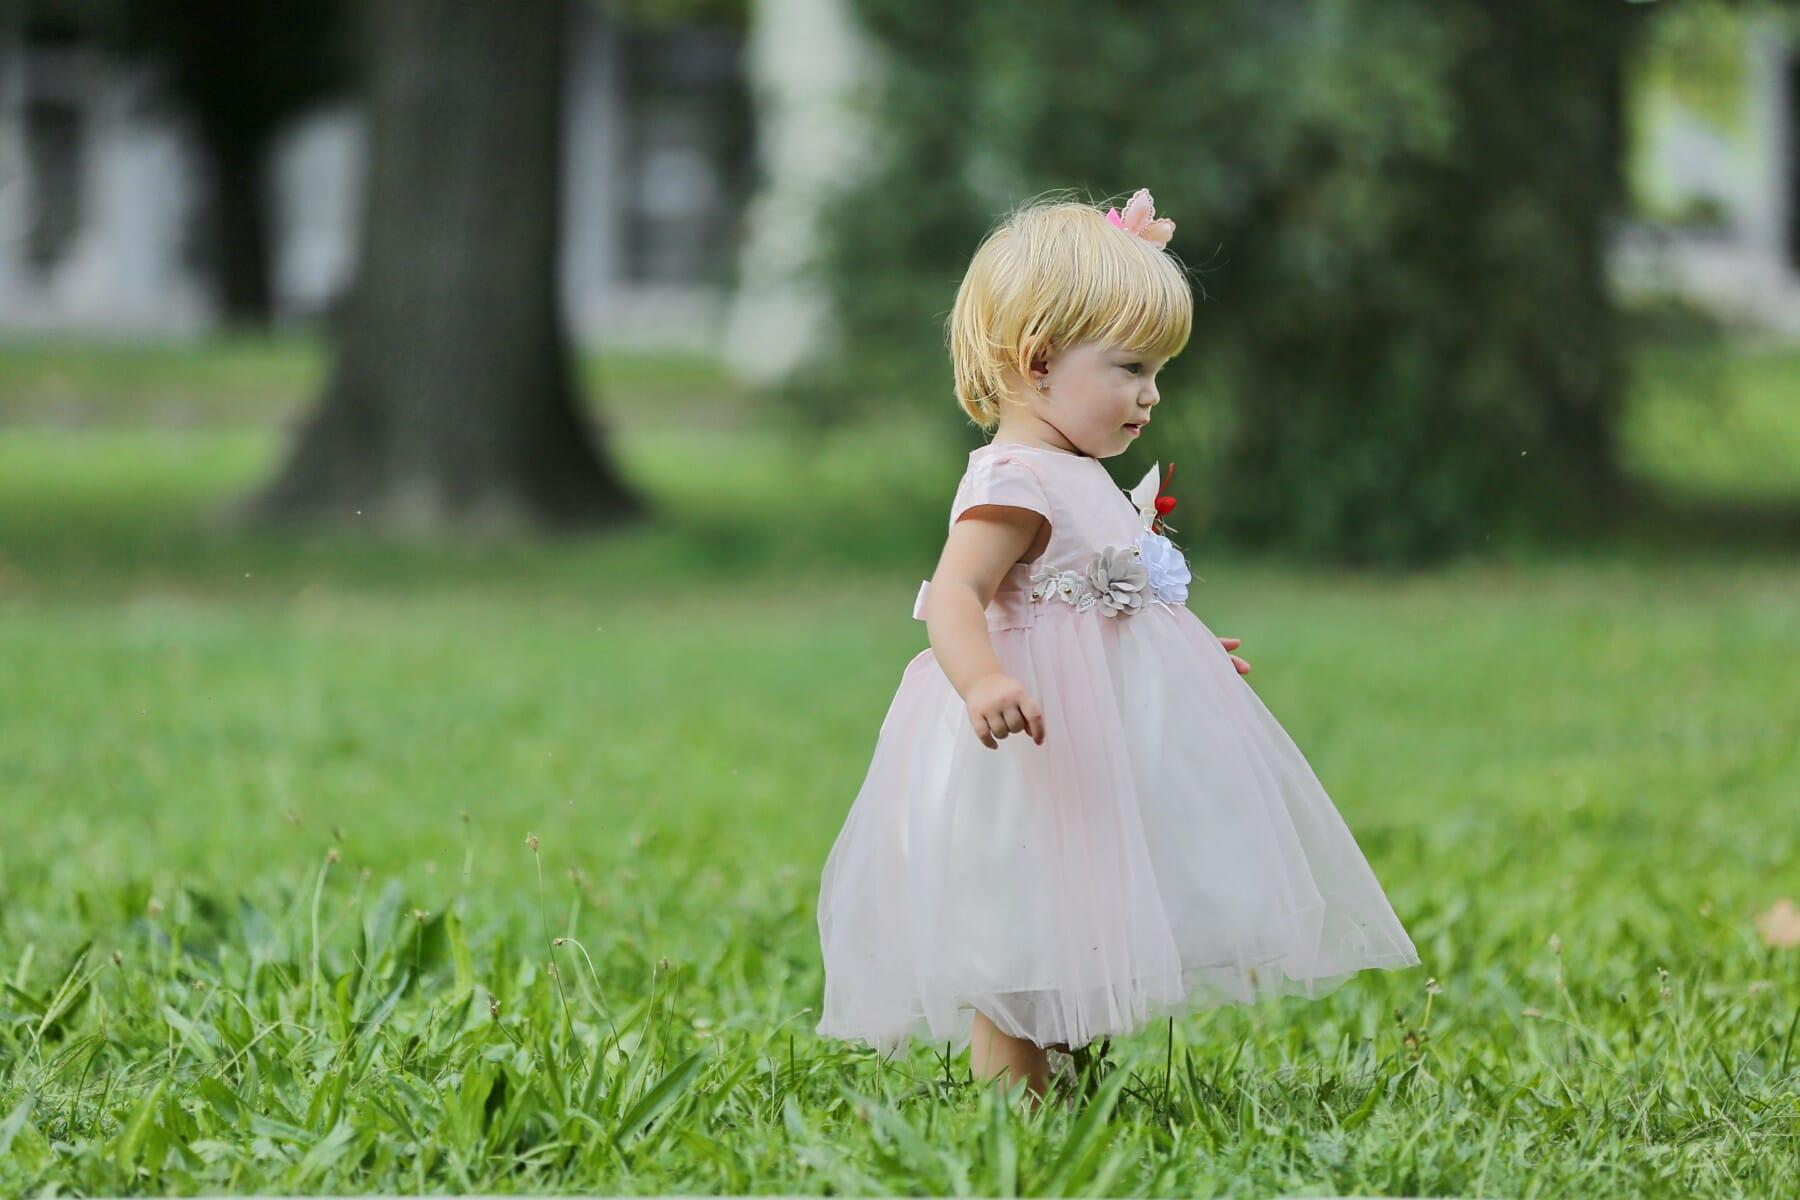 blonde hair, toddler, pretty girl, lawn, green grass, walking, grass, dress, child, married